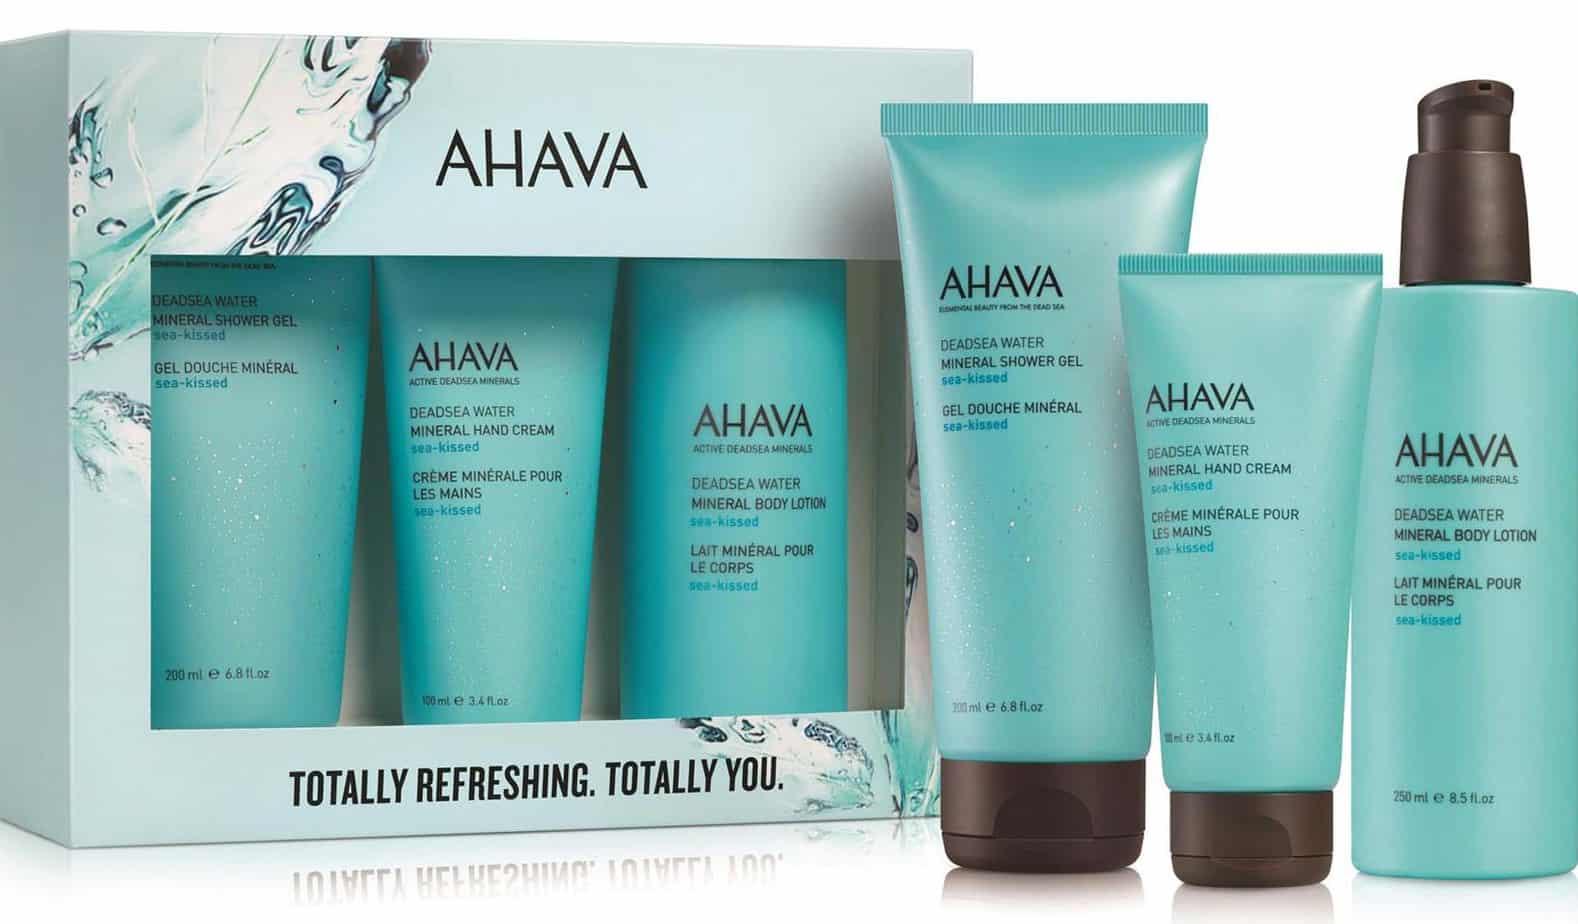 Kit Totally Refreshing. Totally מארז טיפוח לוולנטיין מבית AHAVA מחיר 129 שח צילום מוטי פישביין